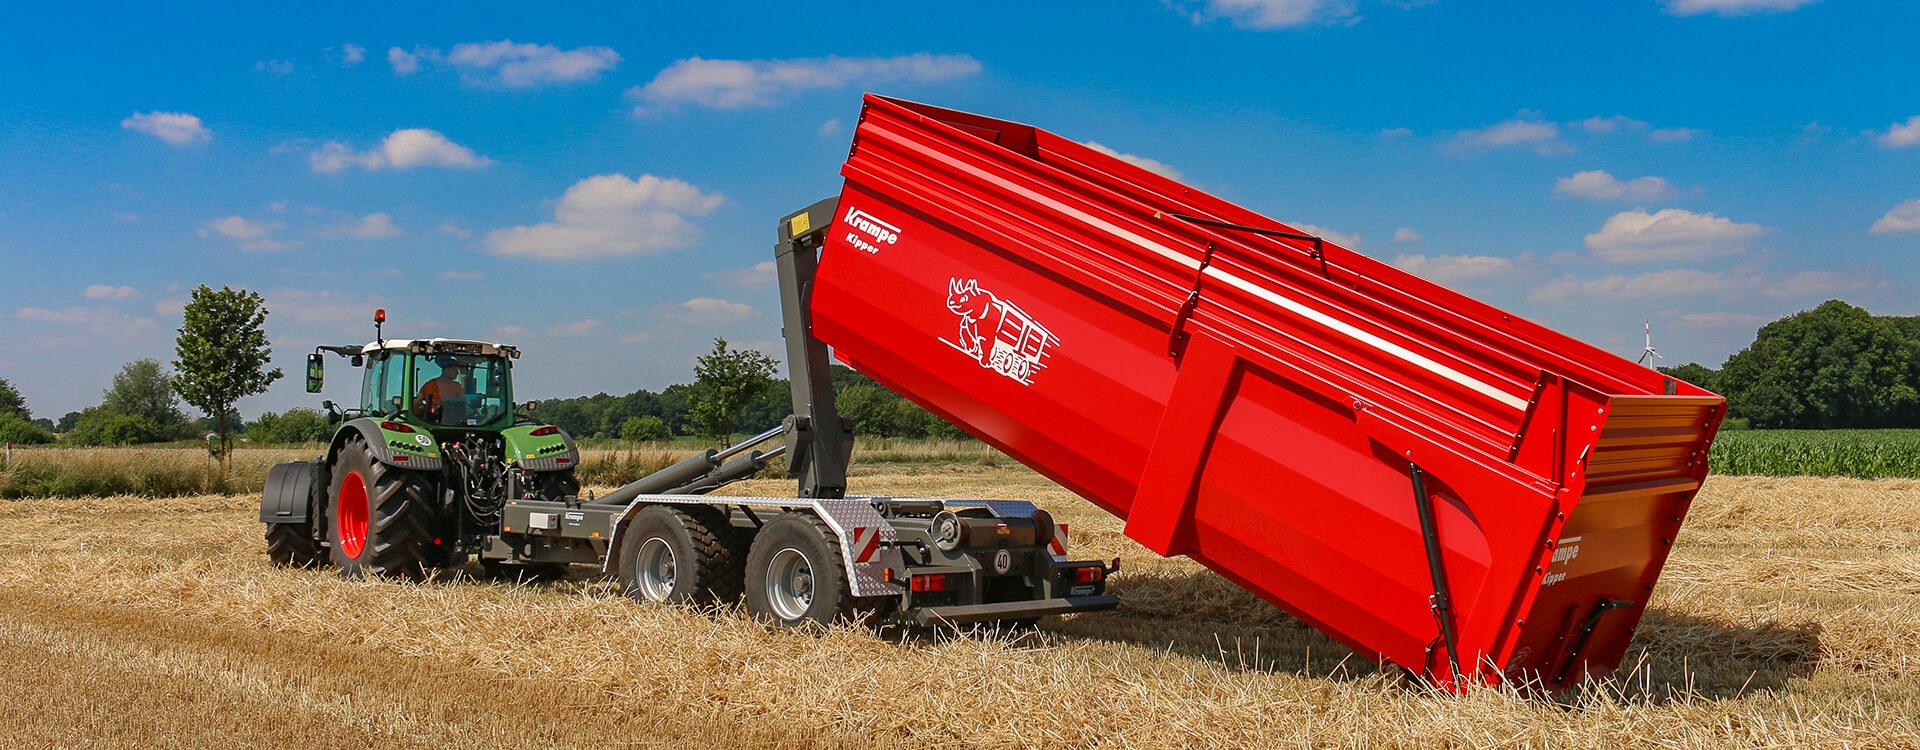 Hooklift trailer lifting body harvest fendt tractor